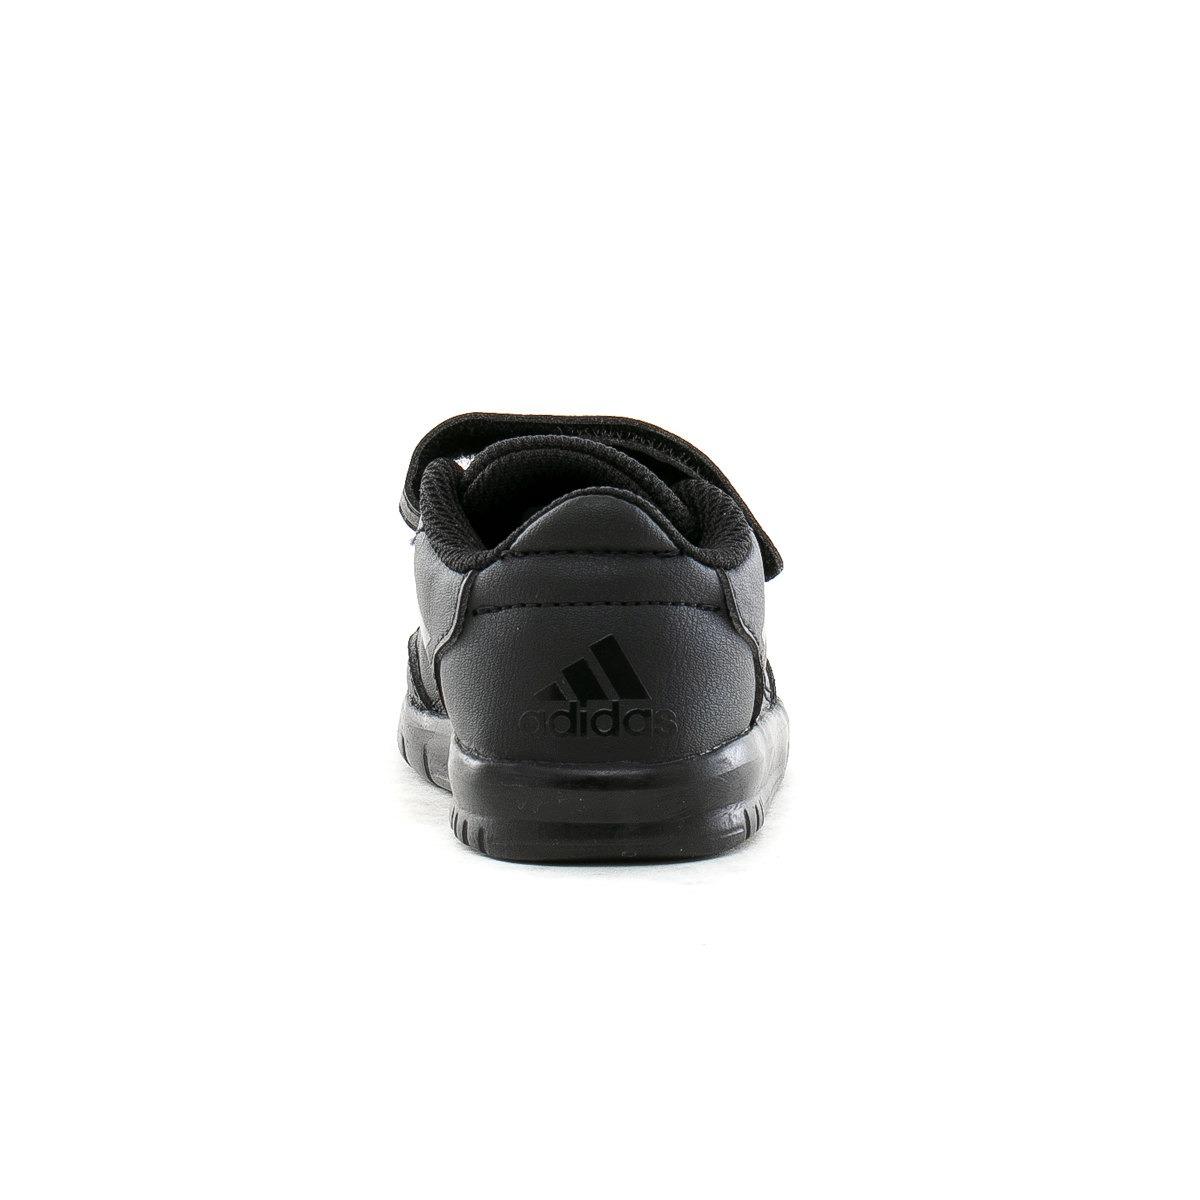 low priced 3b558 e5b8b zapatillas altasport cf i black adidas. Cargando zoom.